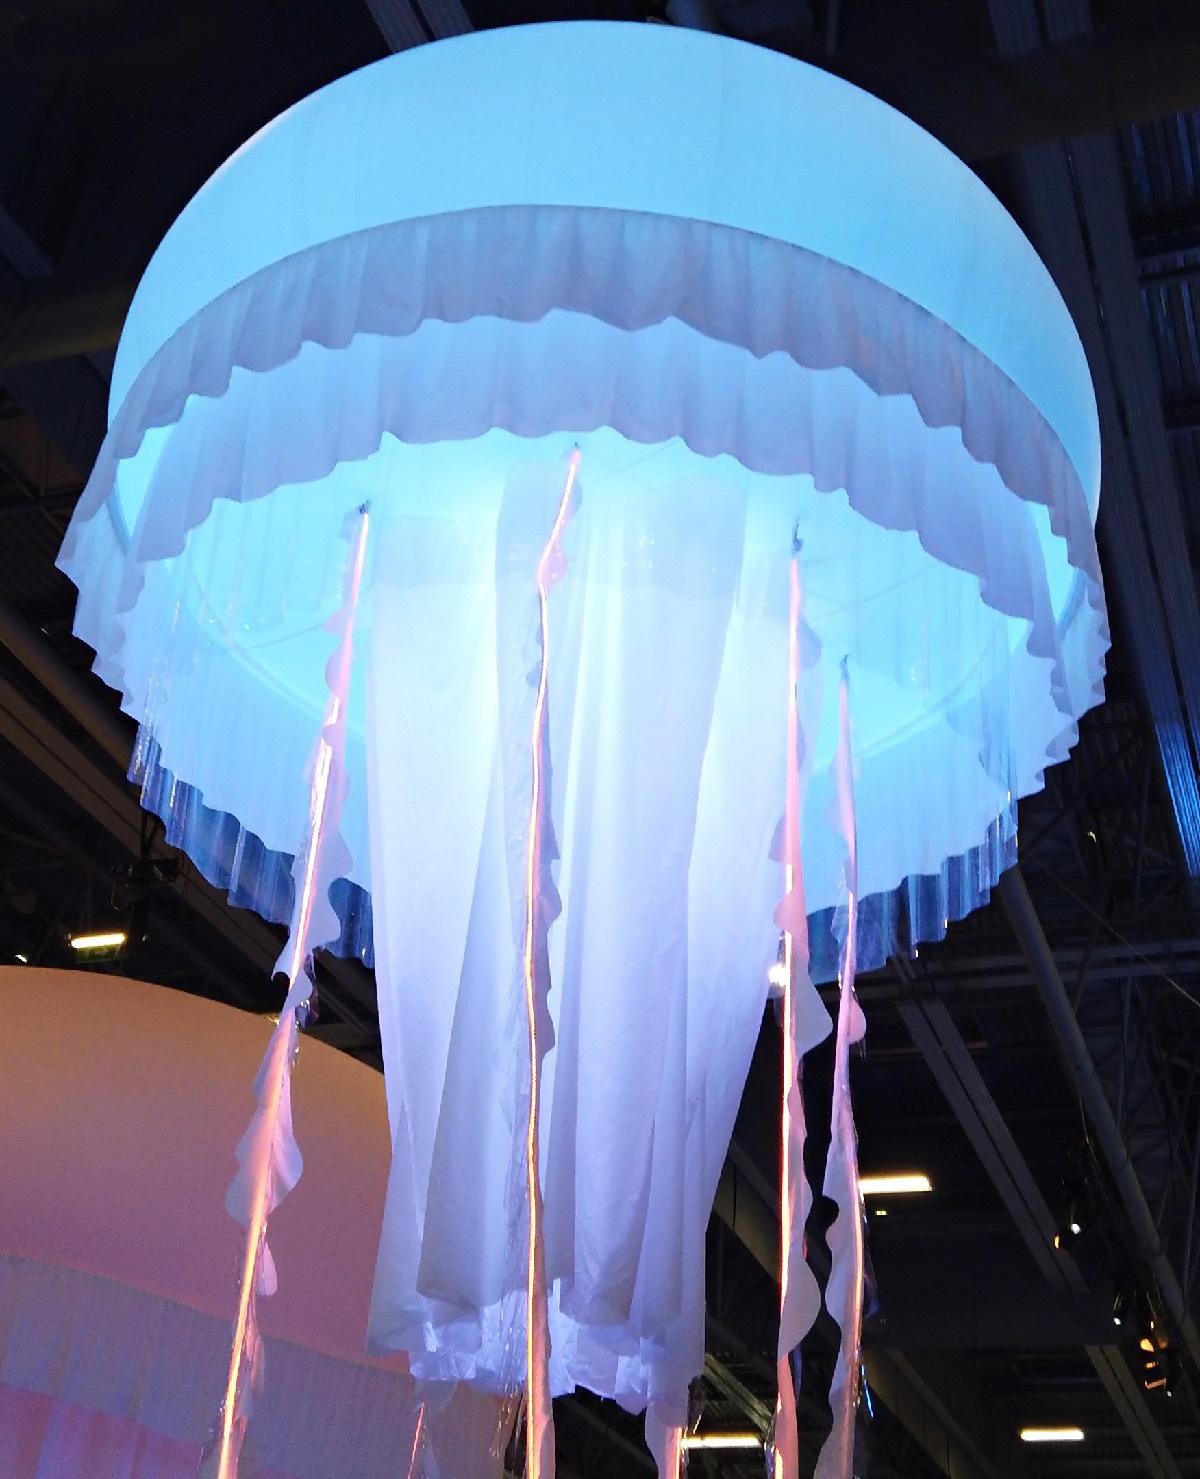 Méduses géantes, La mer XXL, exposition, Nantes - artiste scénographe : Philippe Jouillat © Robert Laganier